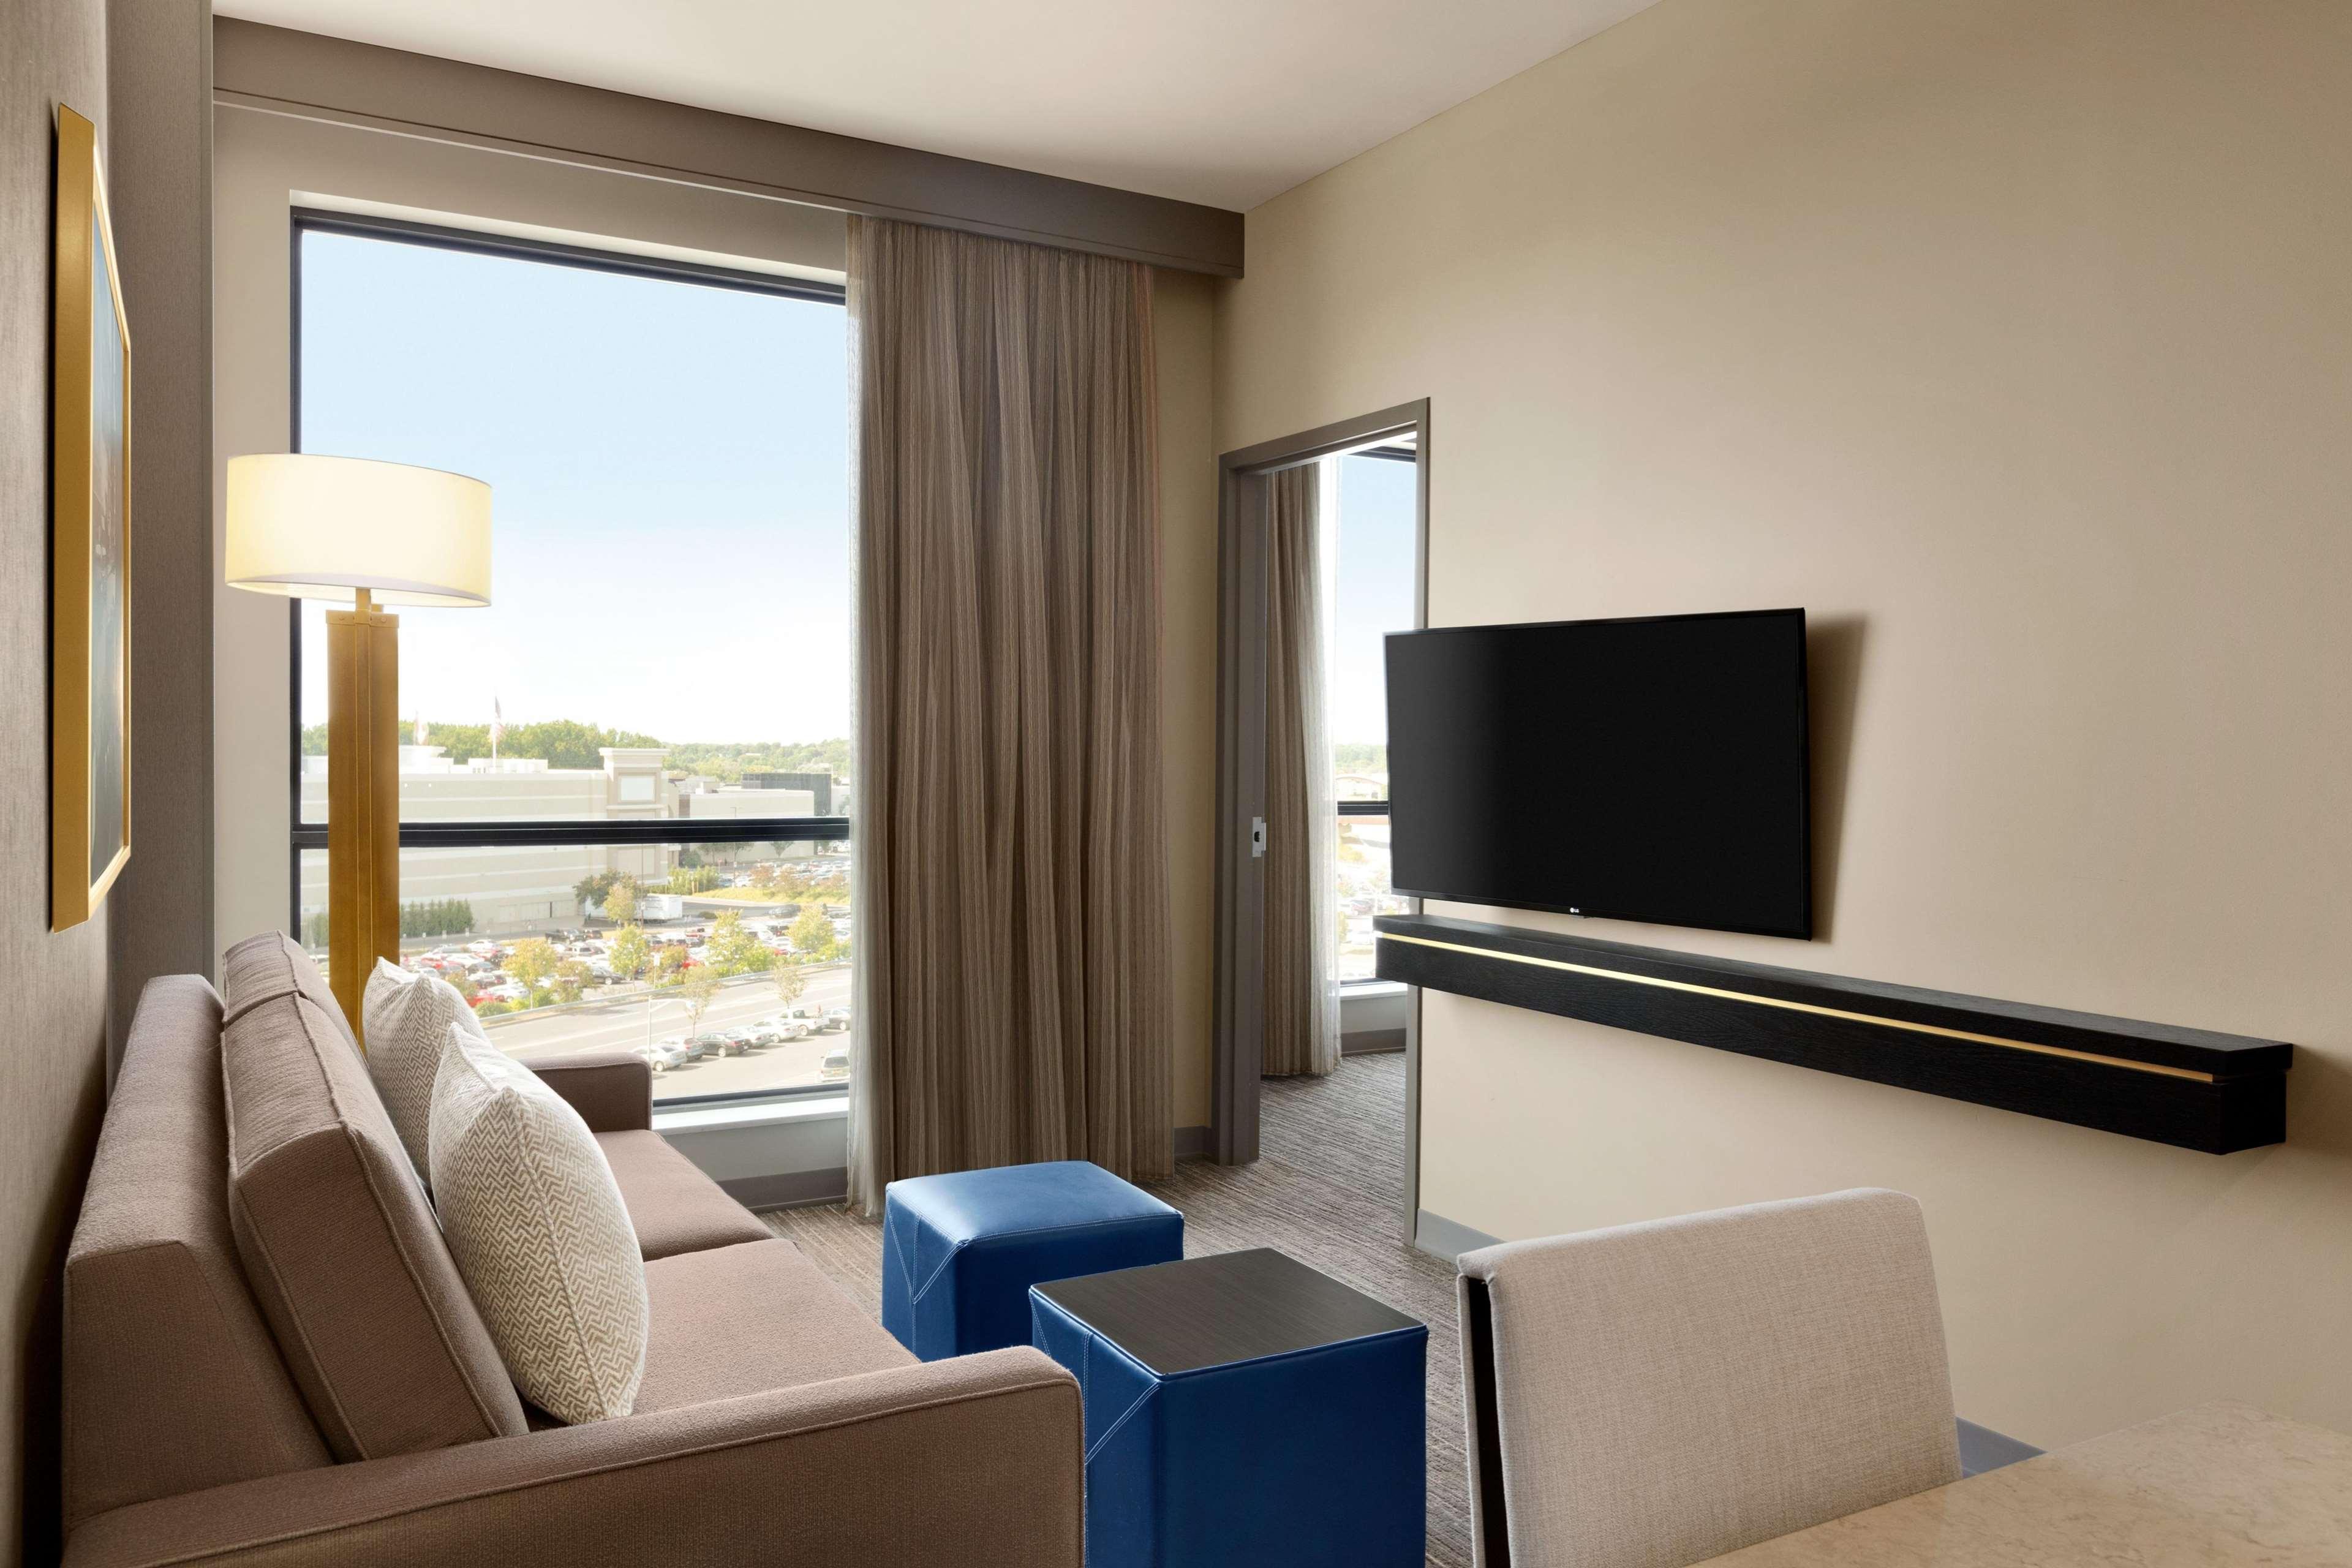 Embassy Suites by Hilton Syracuse Destiny USA image 12